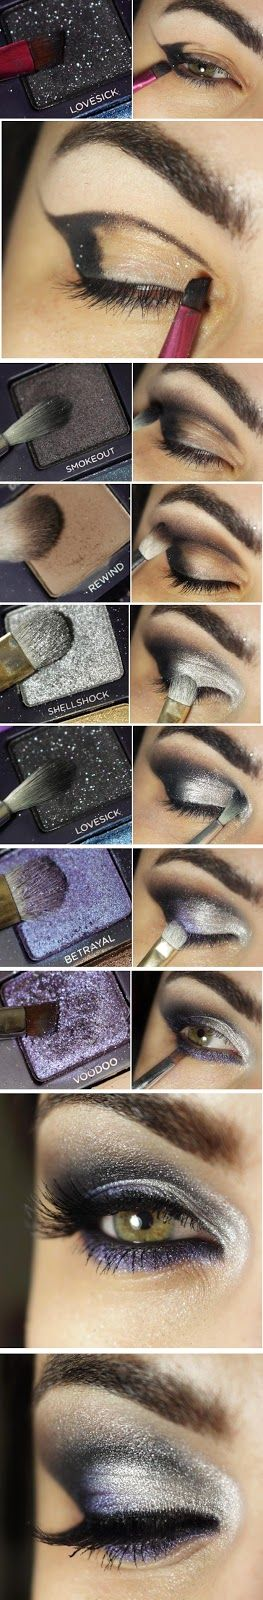 Fabulous Powerful Metallic Makeup Tutorials / Best LoLus Makeup Fashion